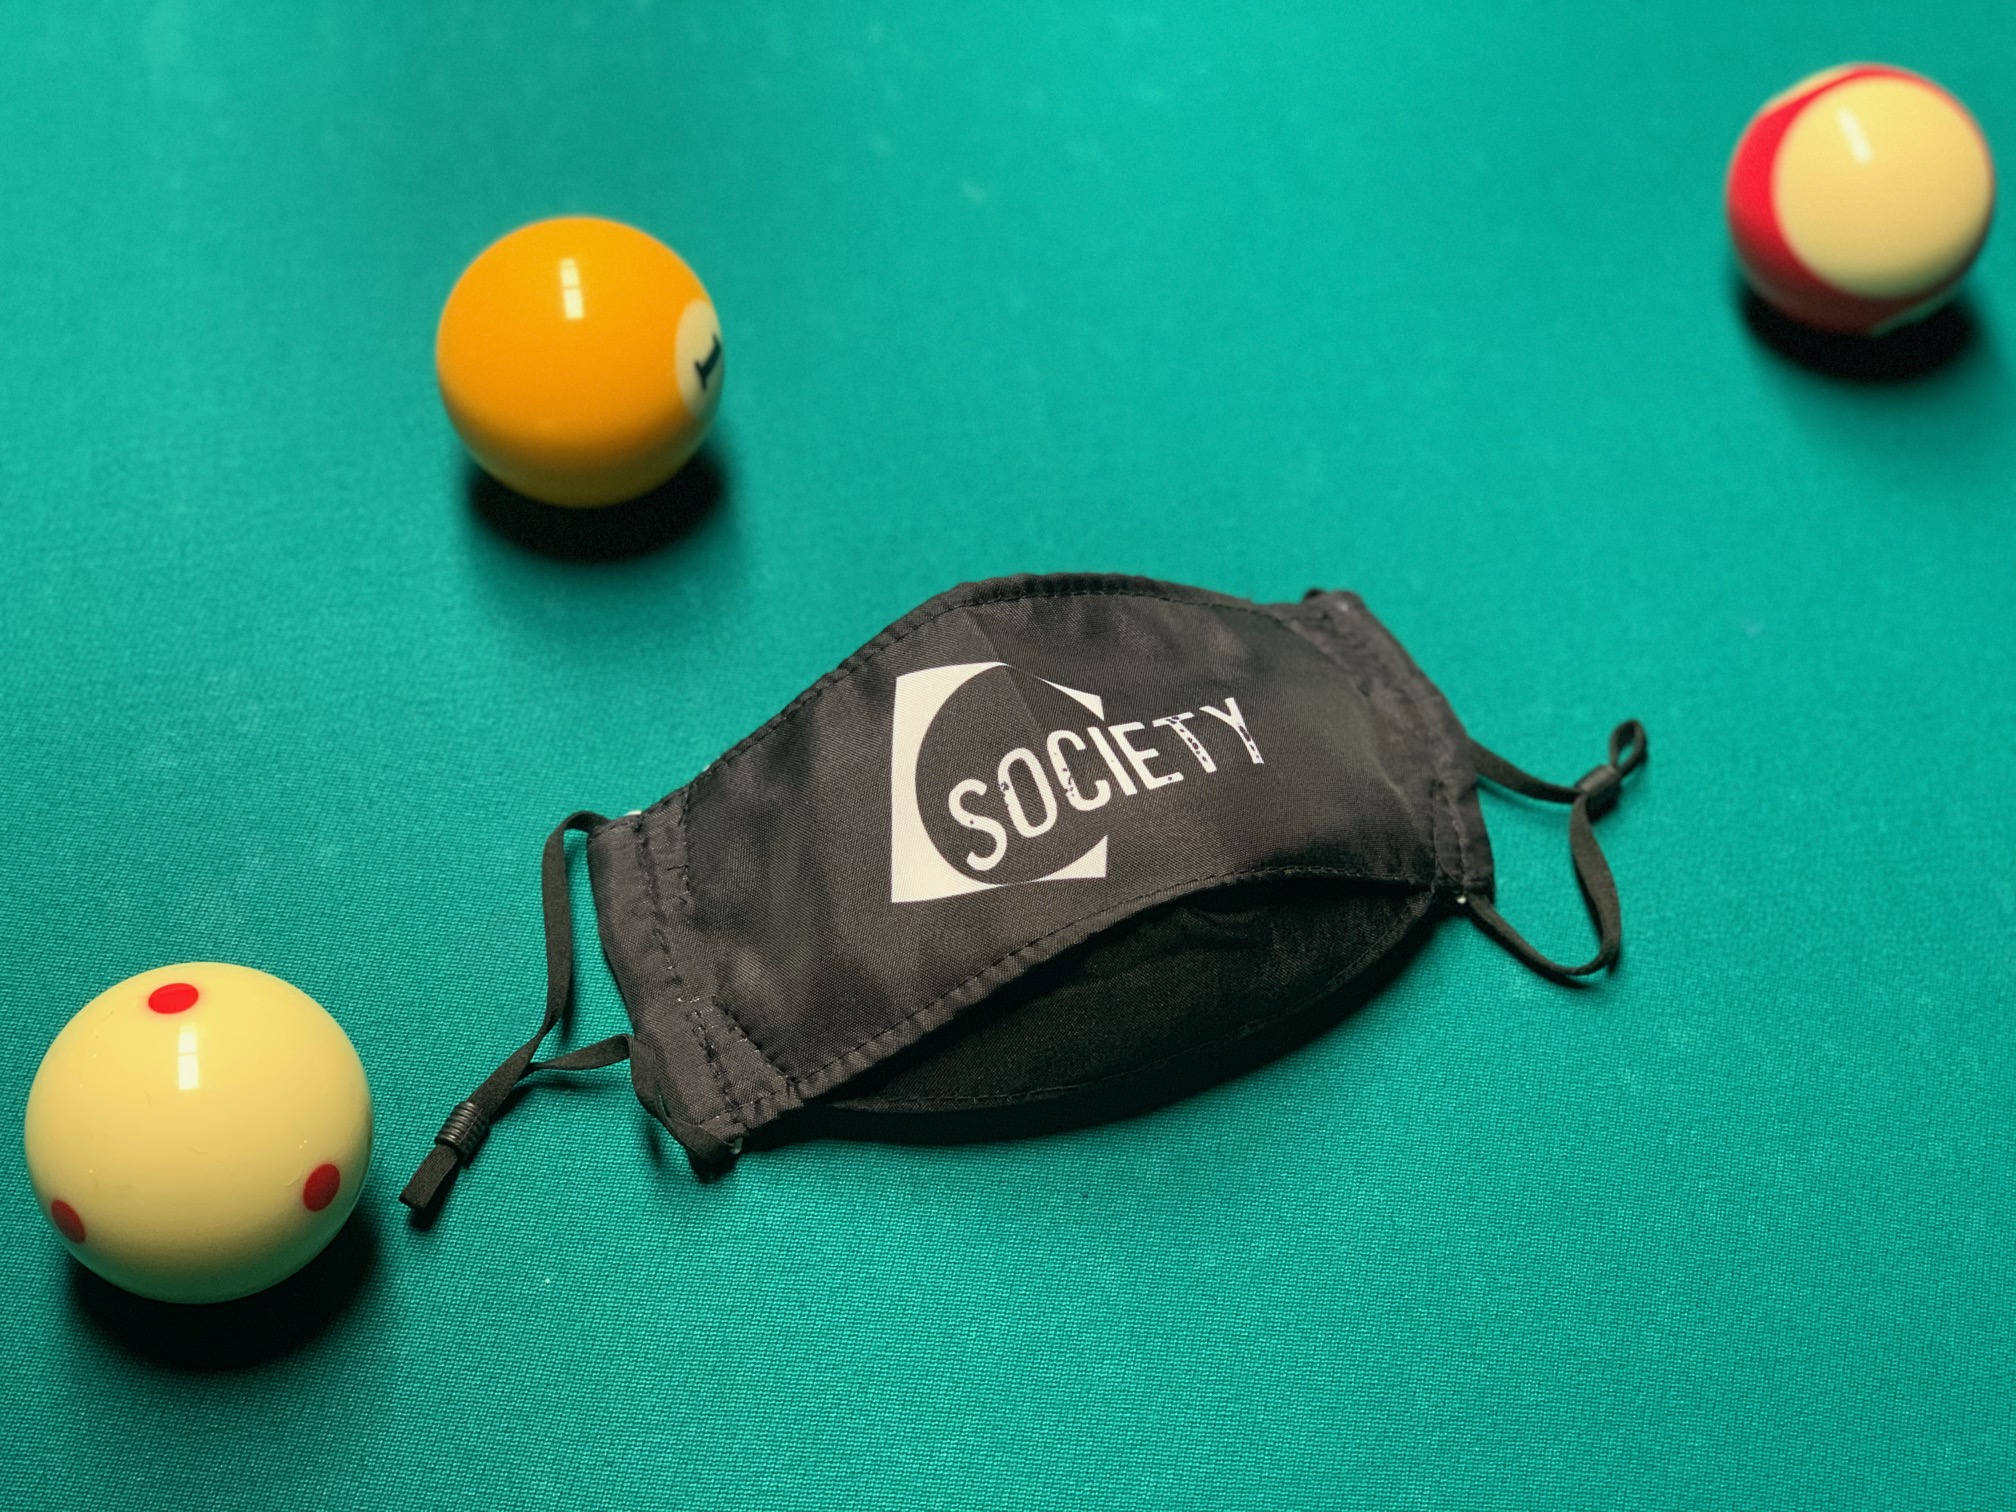 nyc society billiards mask